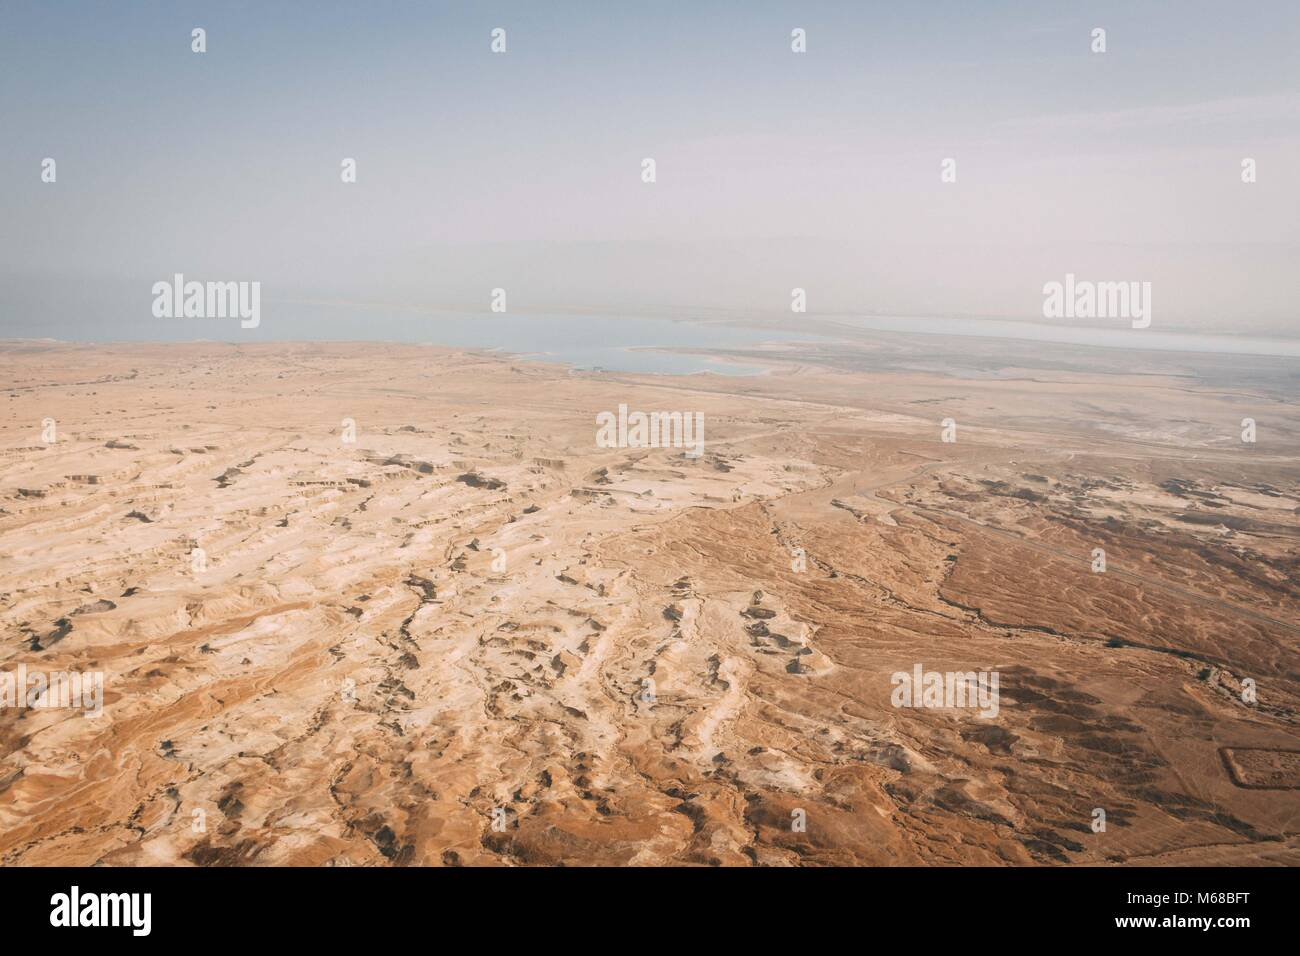 The desert meets the Dead sea Stock Photo